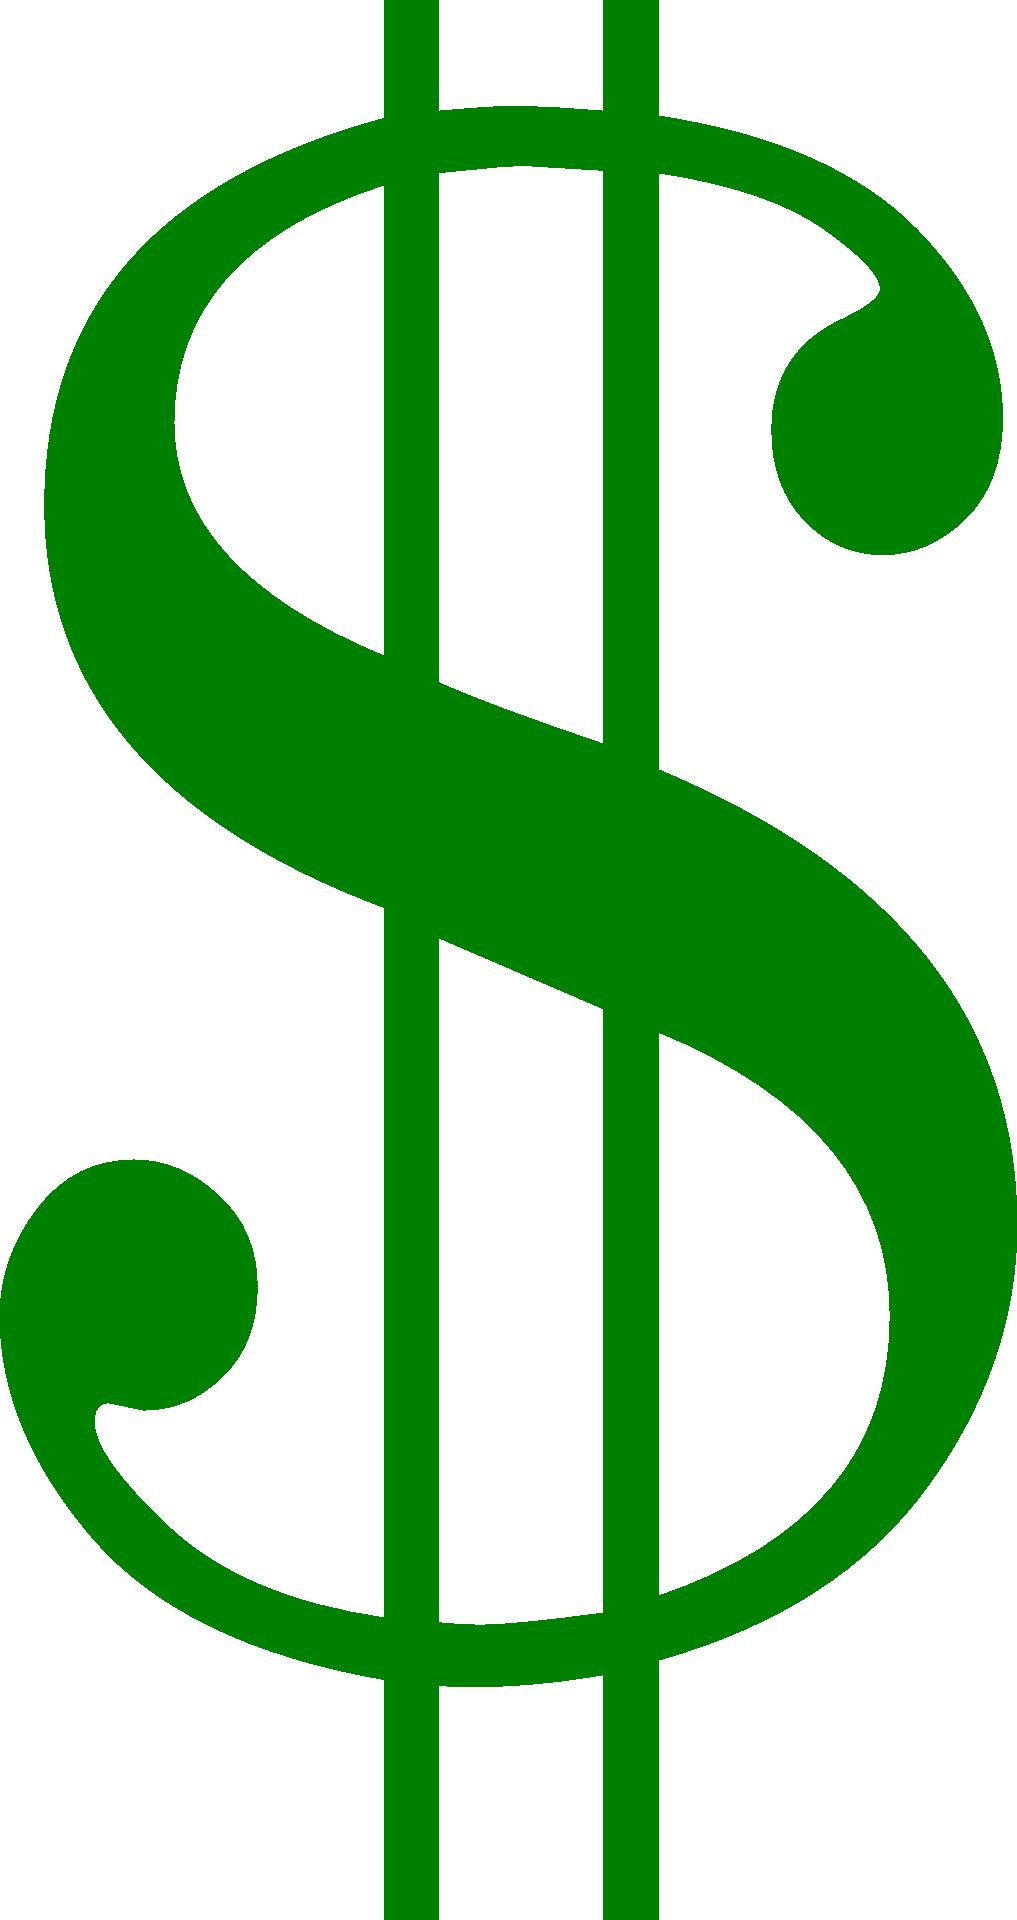 Money symbol clipart transparent image transparent stock Dollar sign United States Dollar Currency symbol Clip art - dollar ... image transparent stock